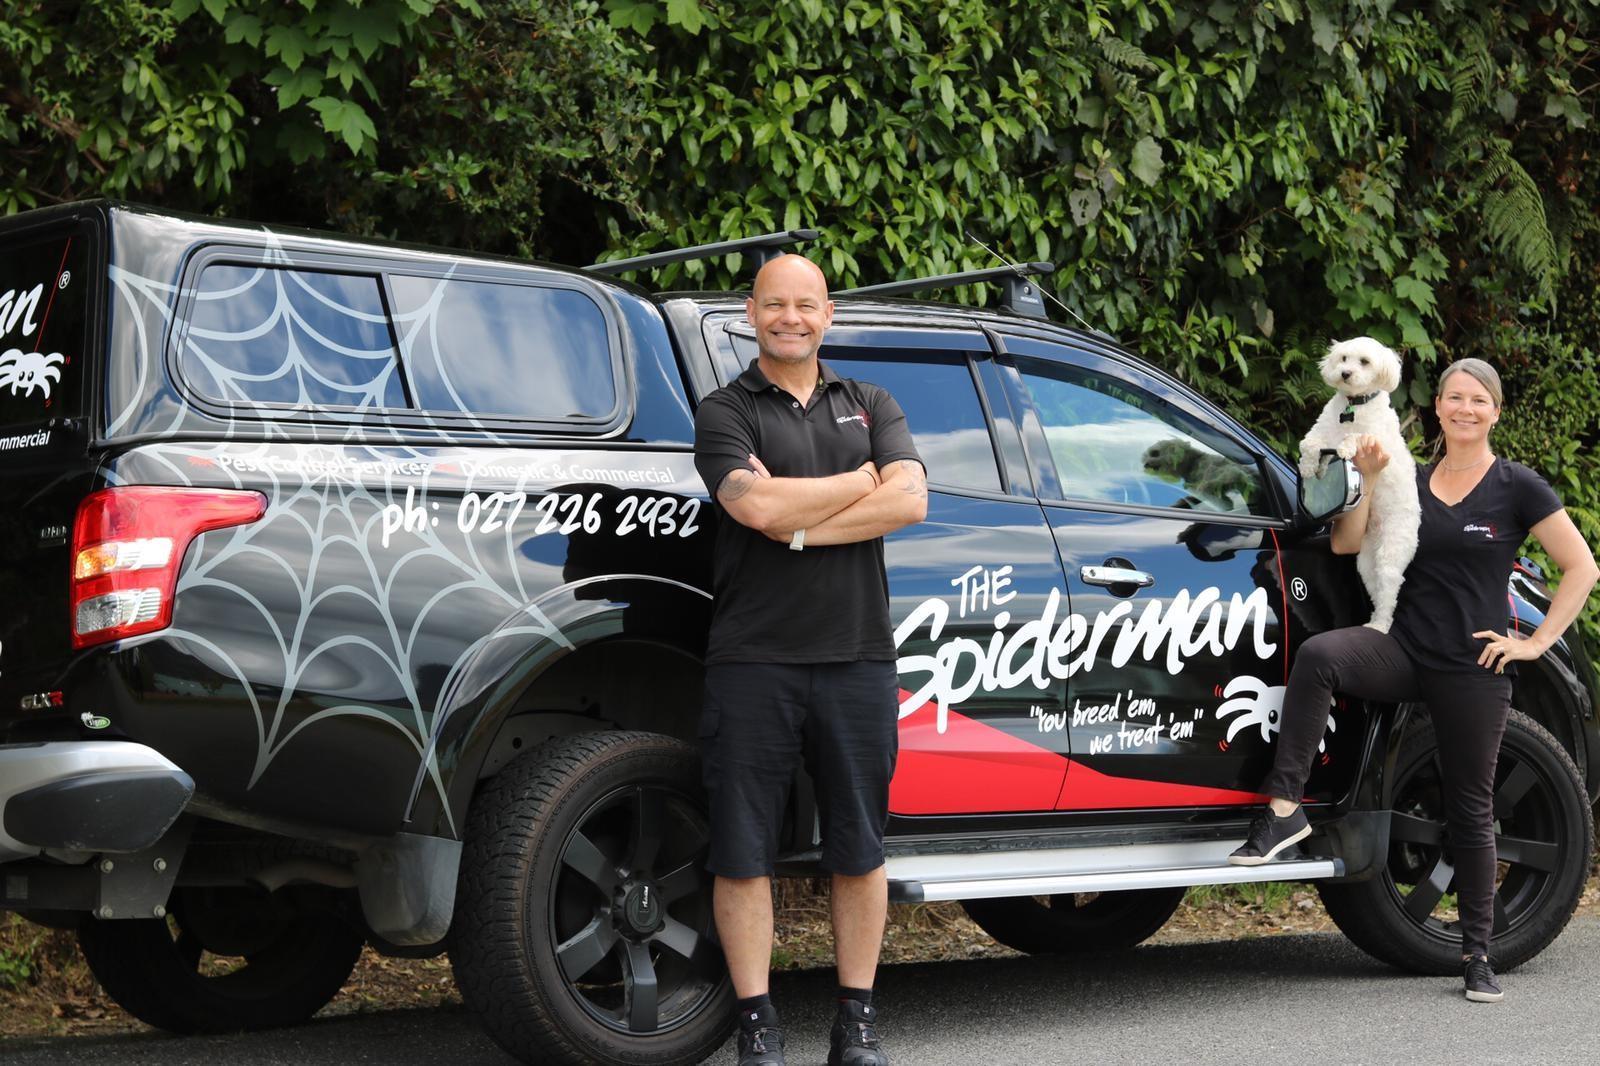 The Spiderman Marlborough Pest Control